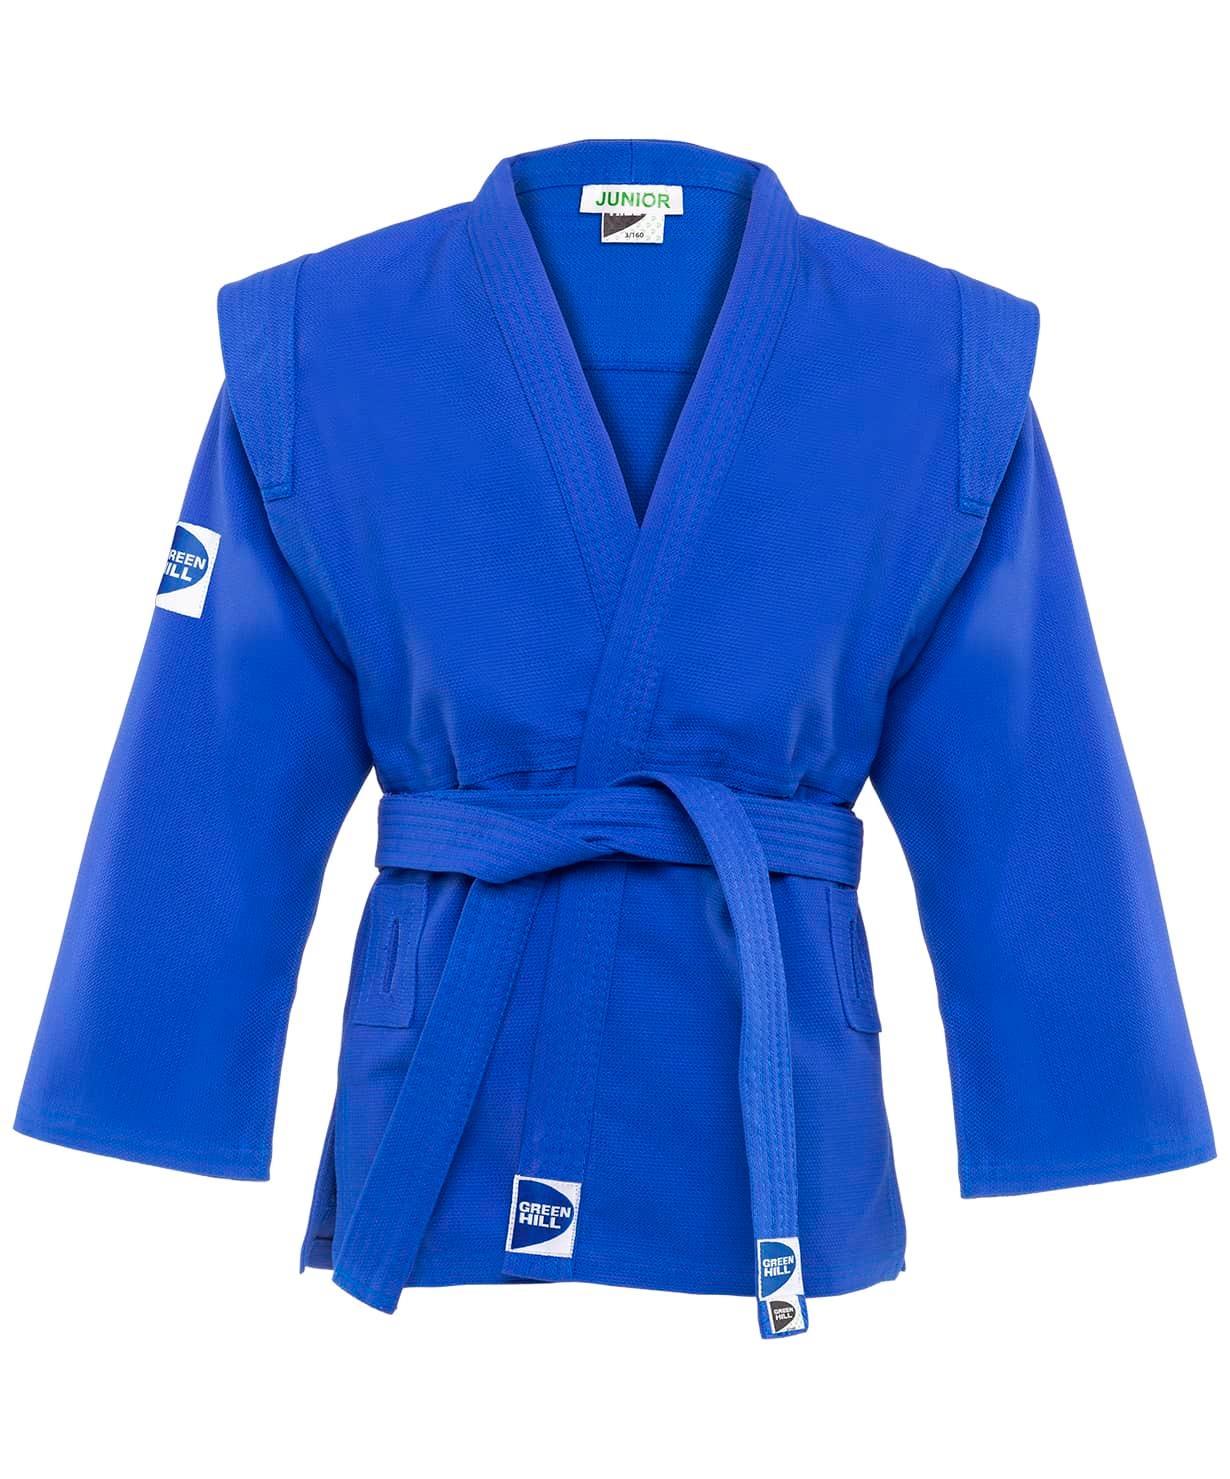 Куртка для самбо Junior SCJ-2201, синий, р.1/140